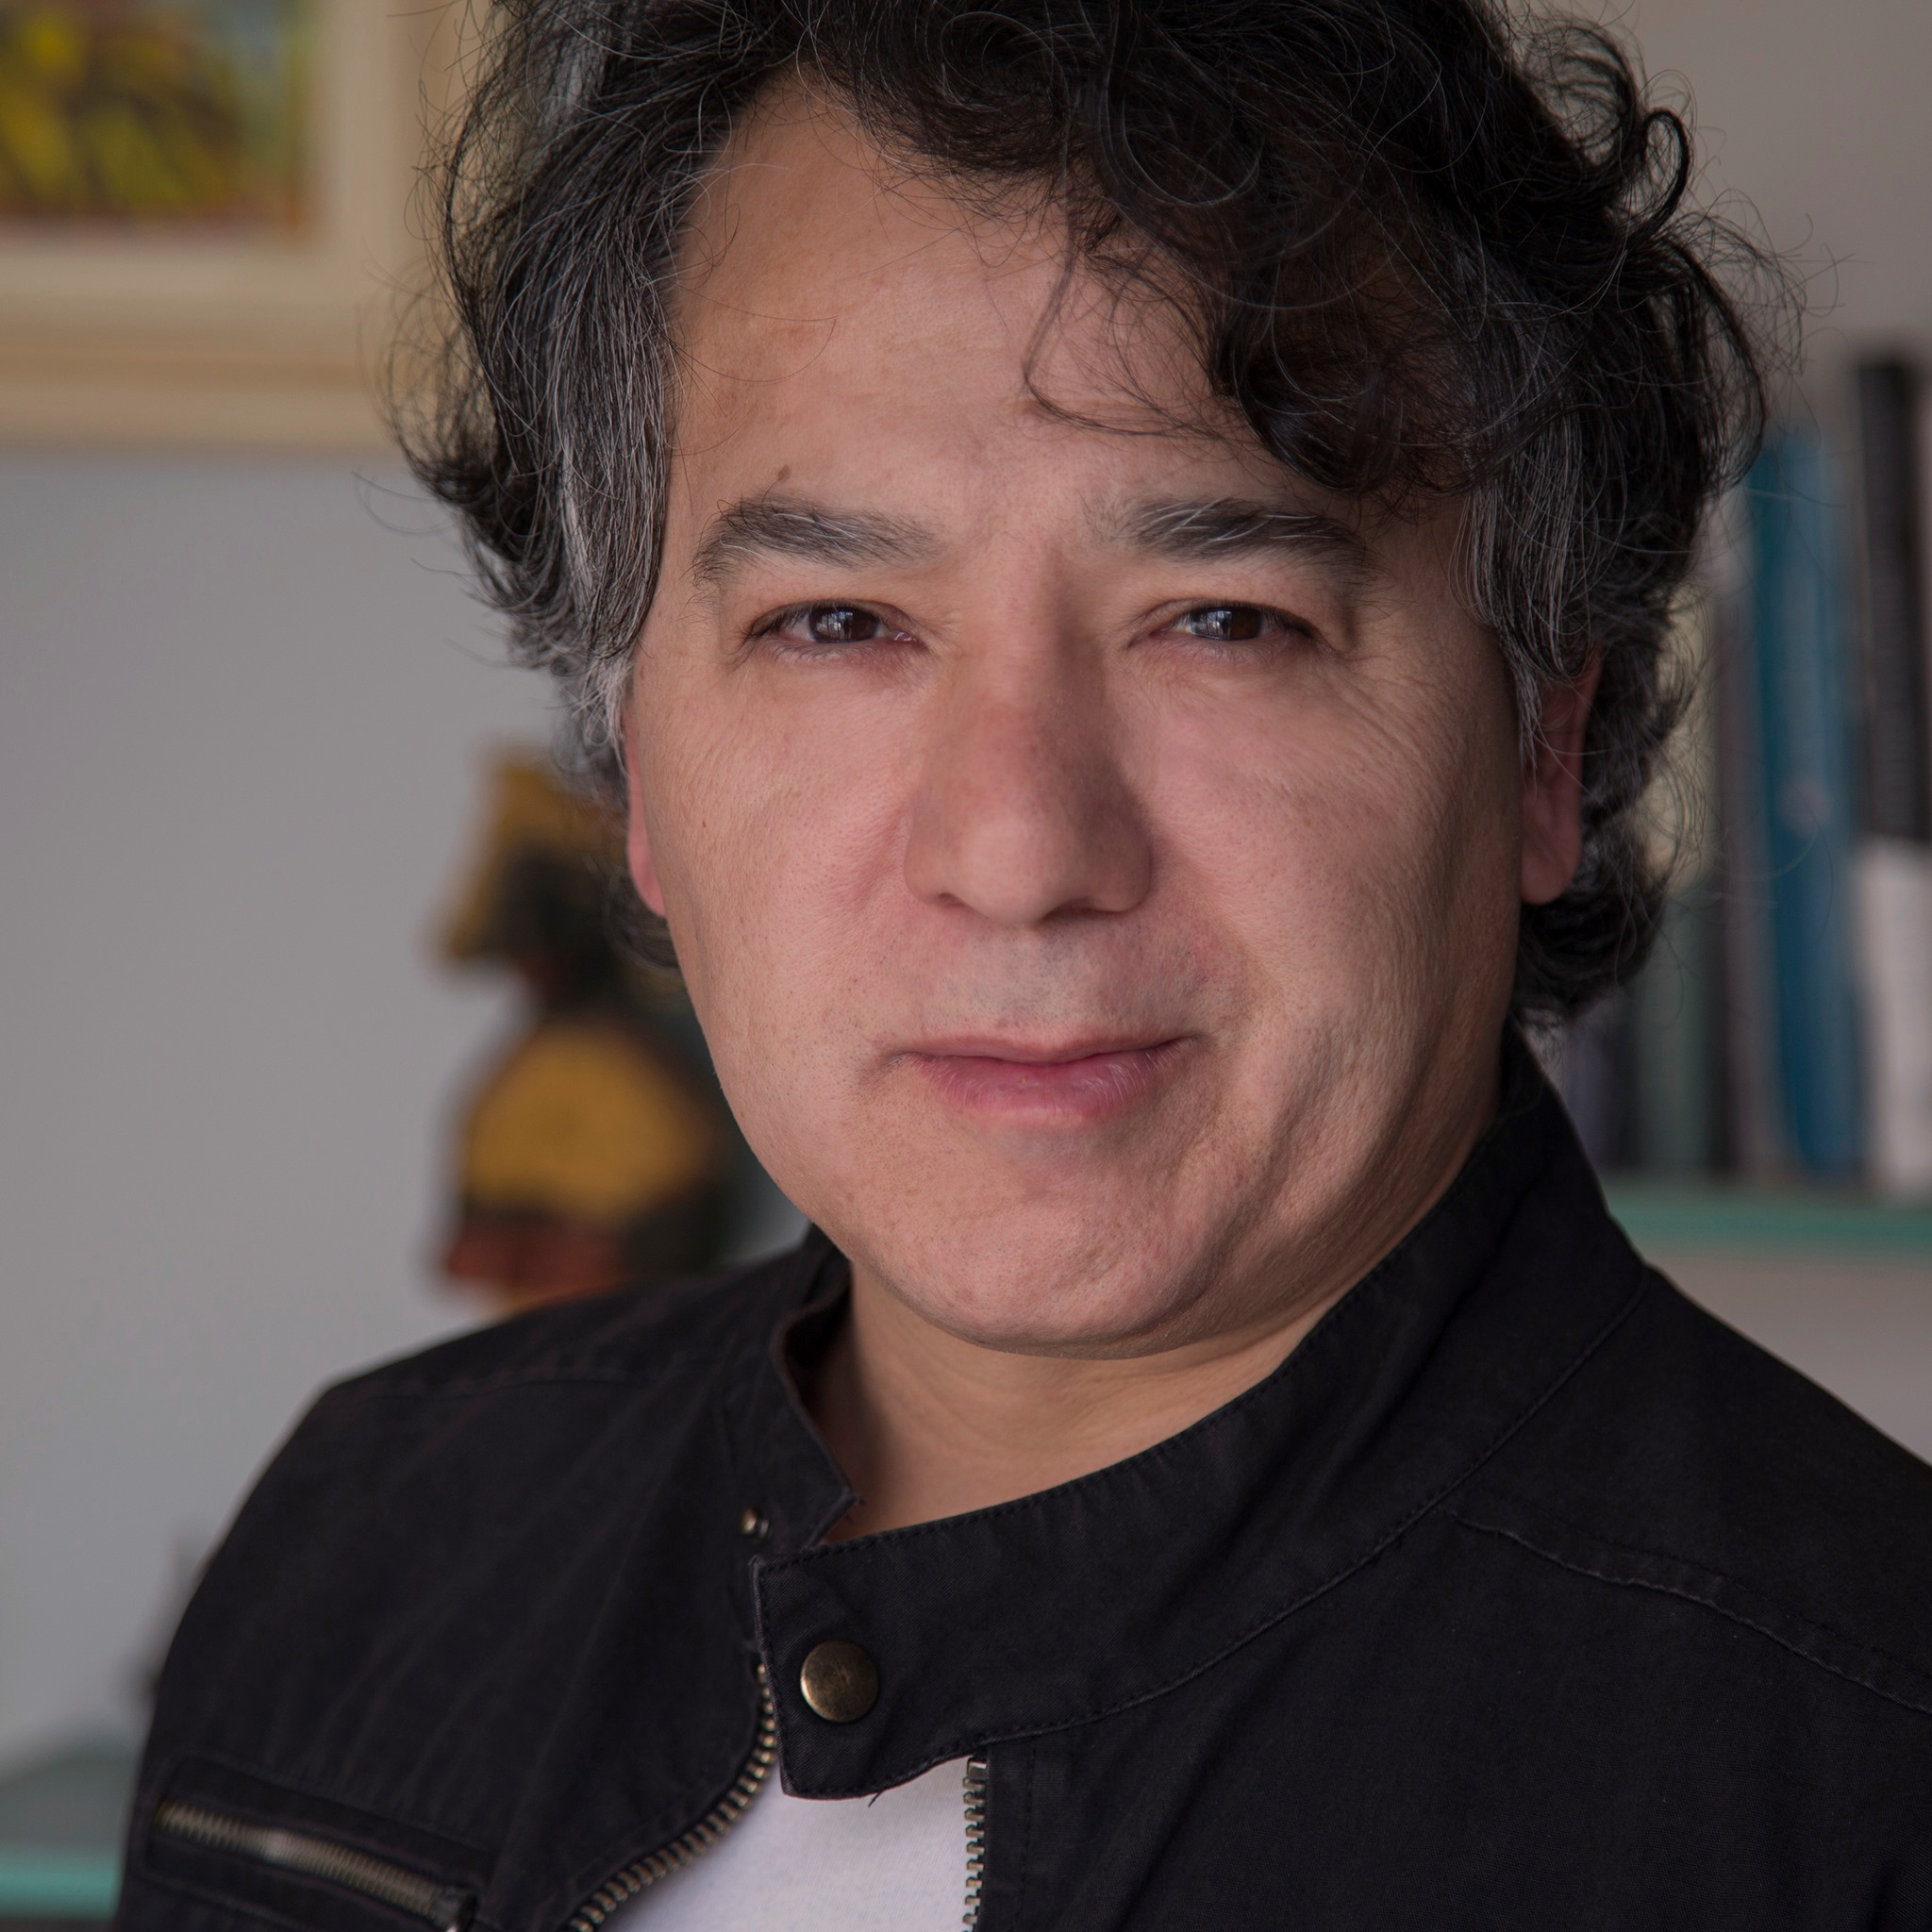 Ciro Nestor Novelli